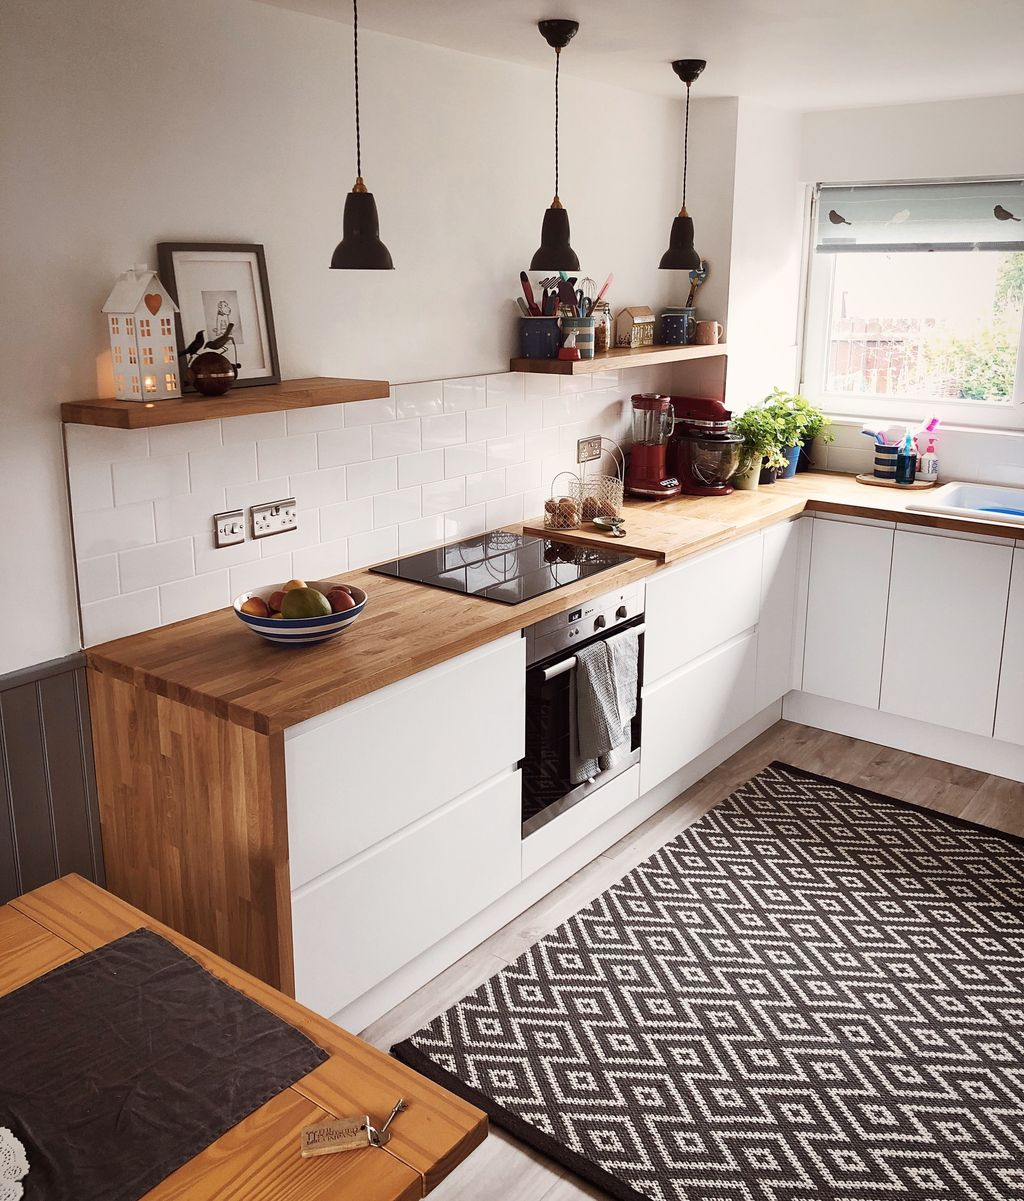 Wonderful Kitchen Lighting Ideas To Make It Look More Beautiful 01